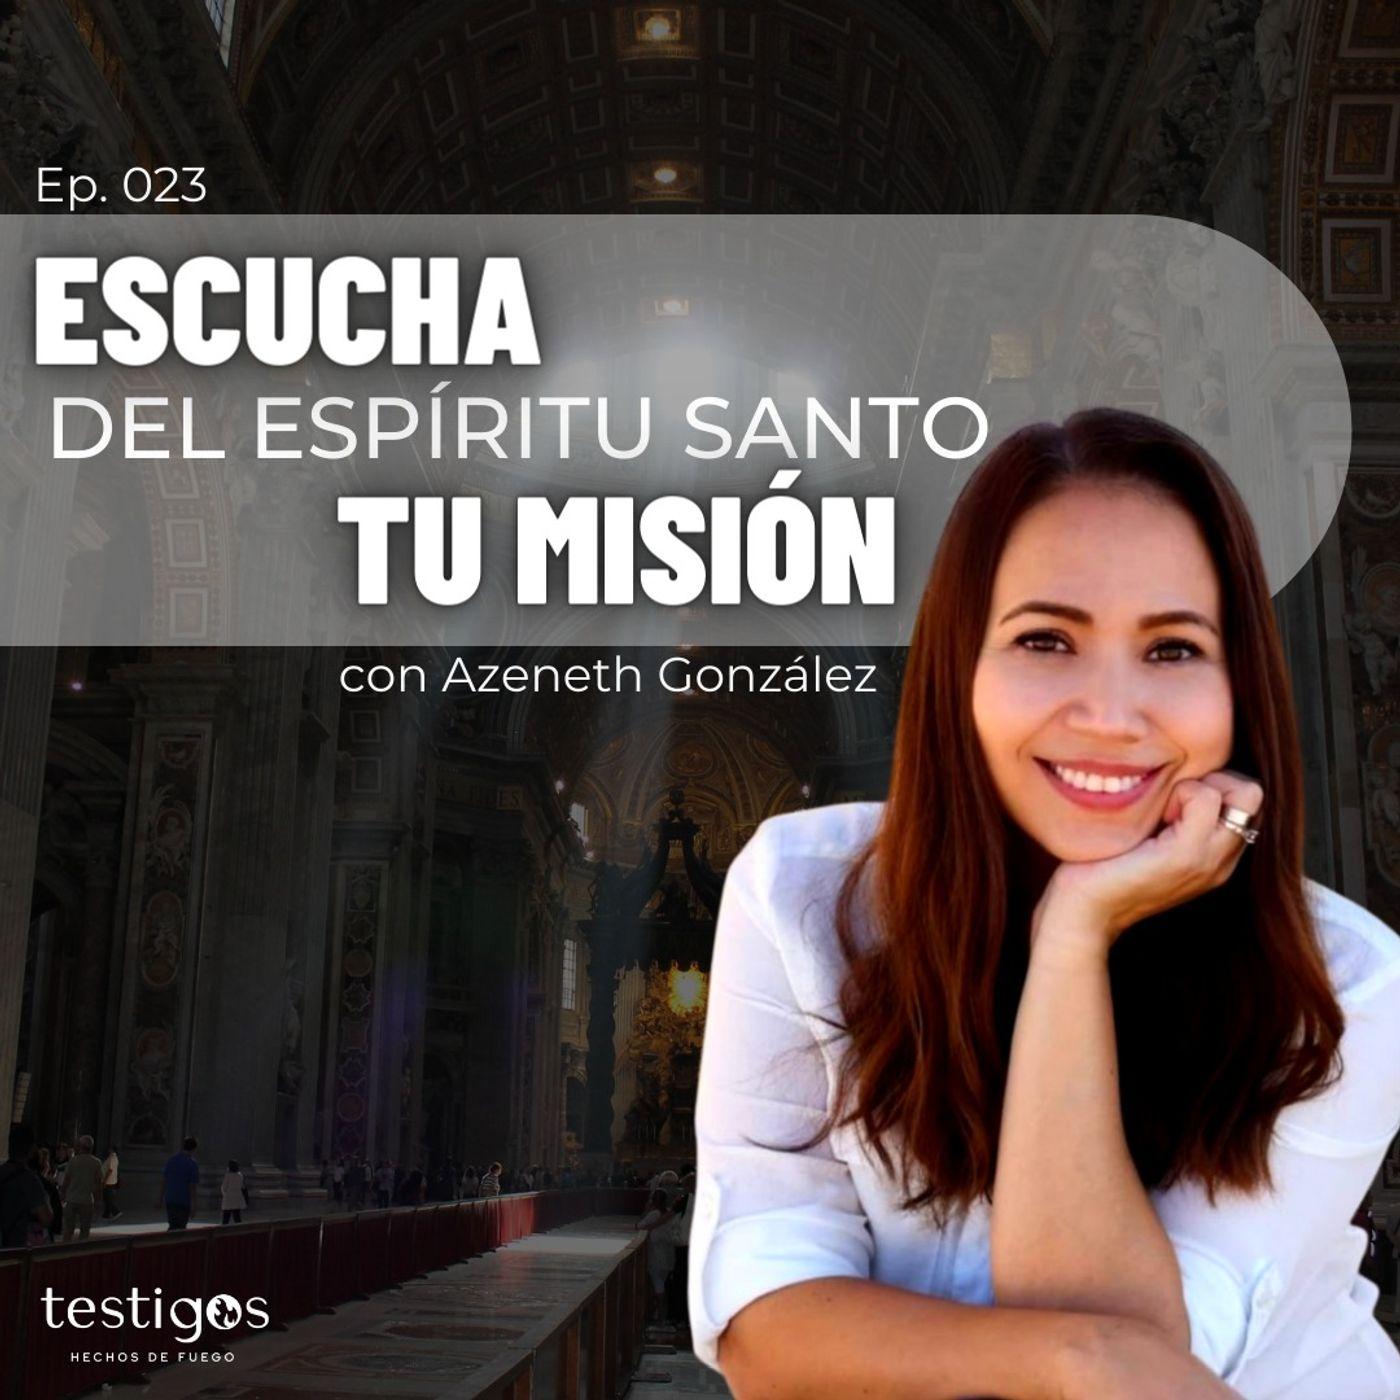 Ep. 023 Escucha del Espíritu Santo tu misión, con Azeneth González